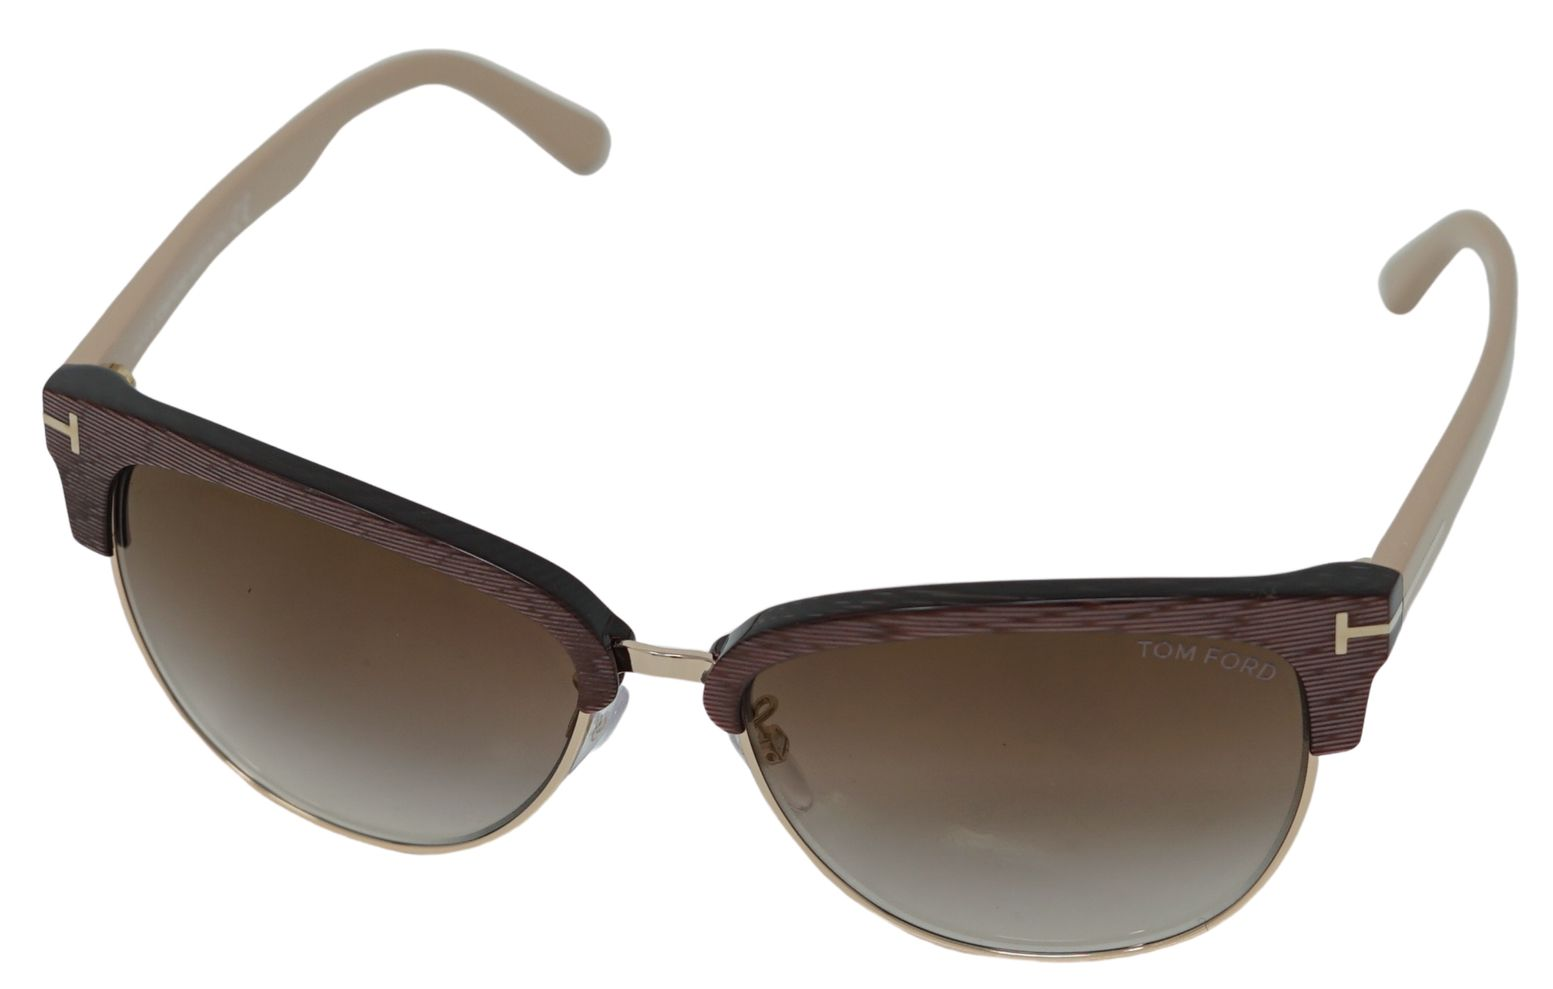 Tom Ford Fany Womens Sunglasses FT0368 50G